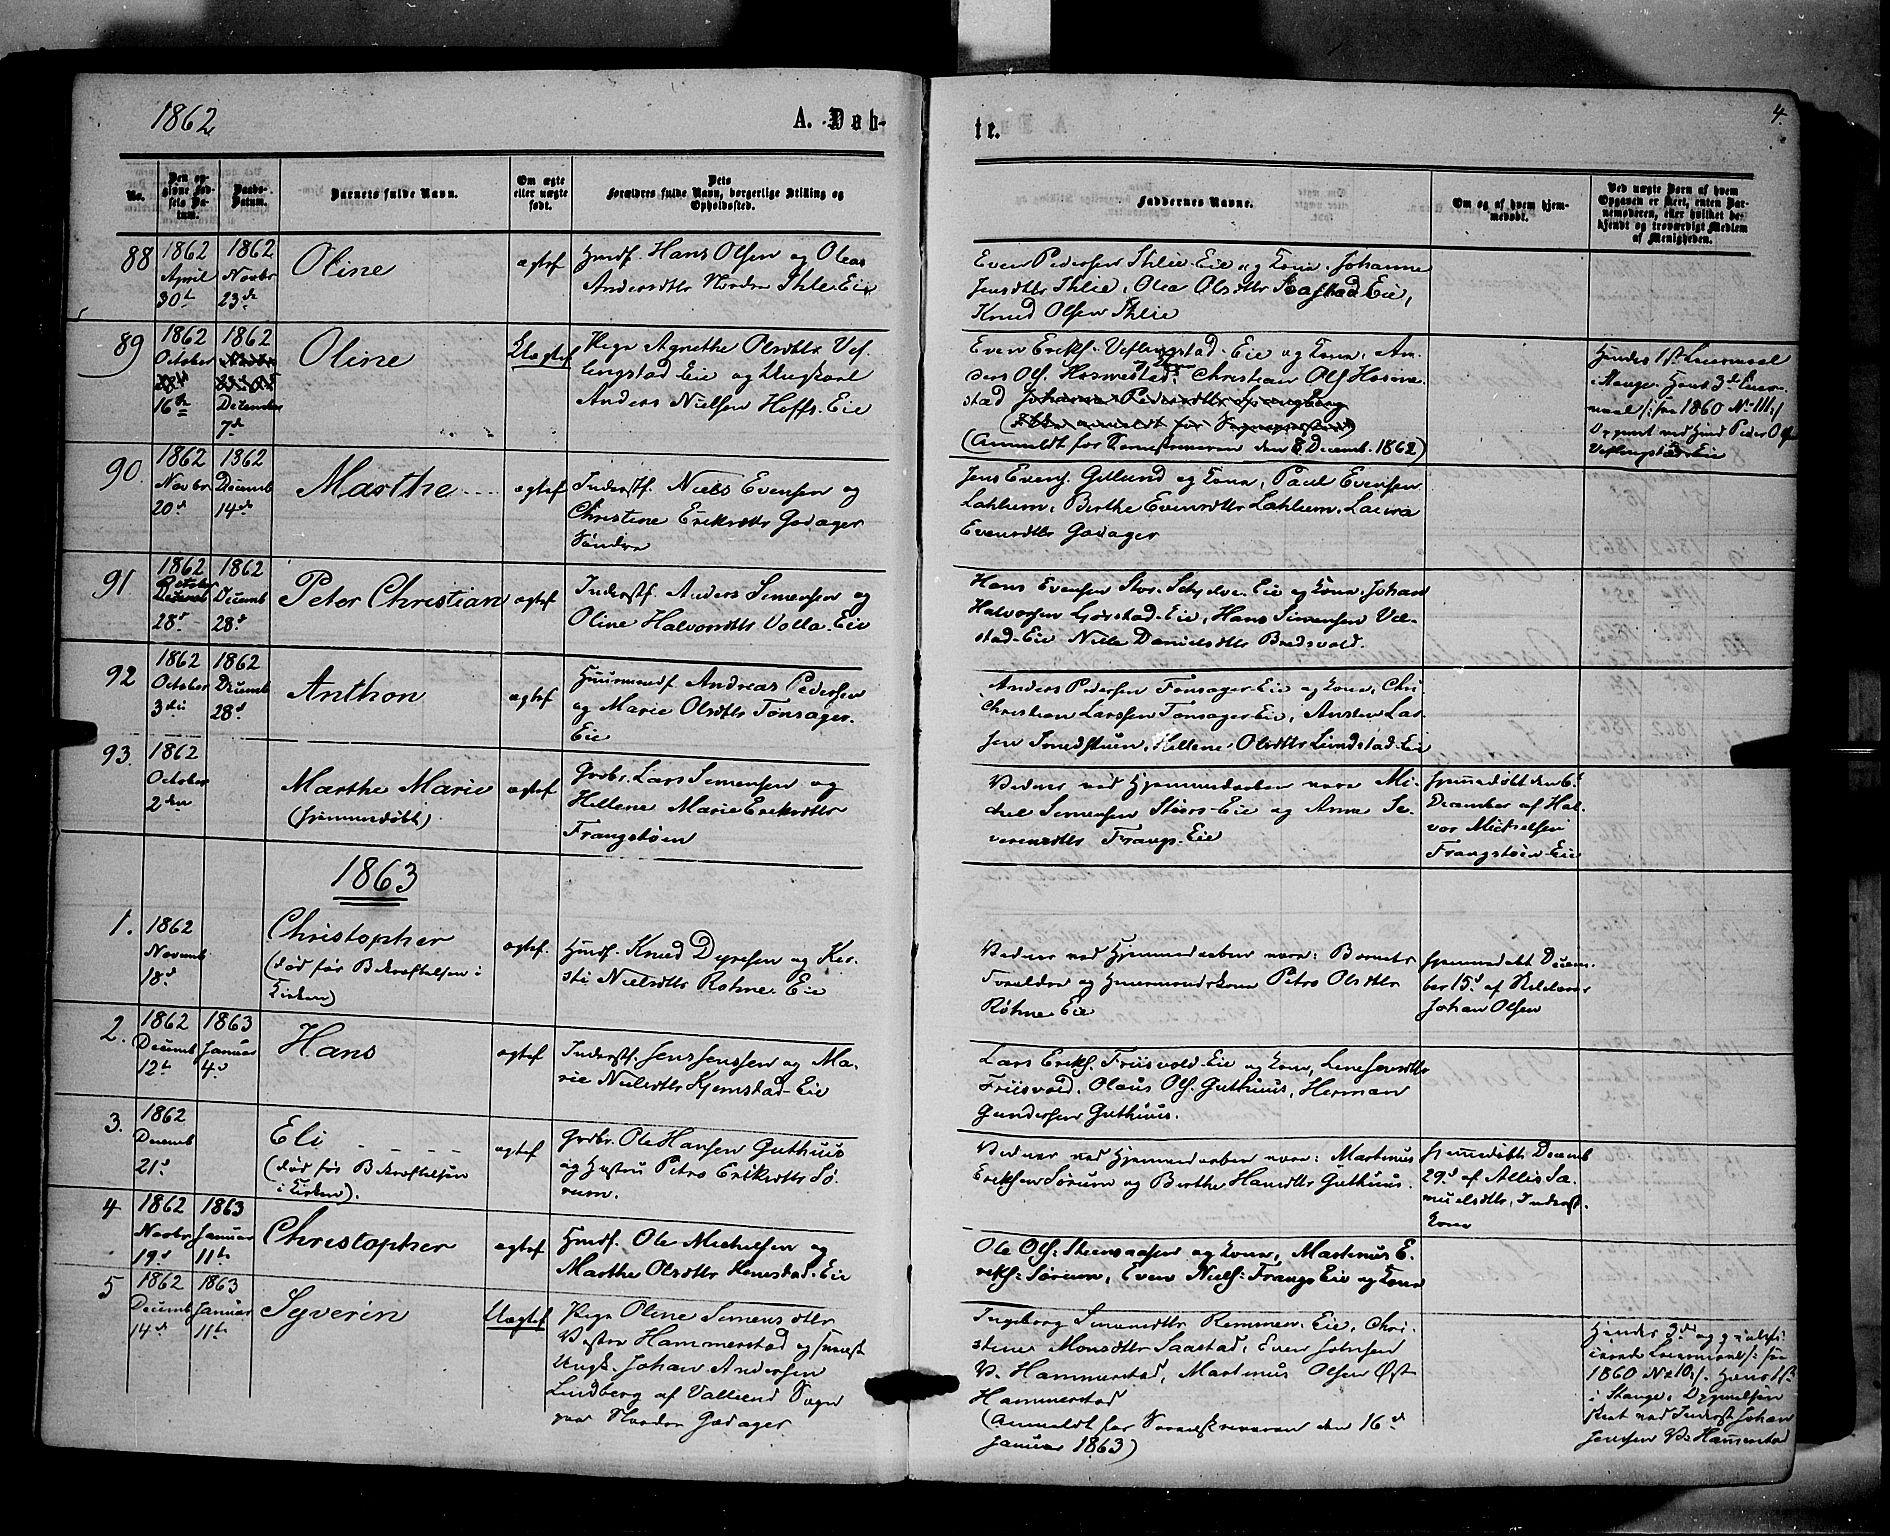 SAH, Stange prestekontor, K/L0013: Ministerialbok nr. 13, 1862-1879, s. 4